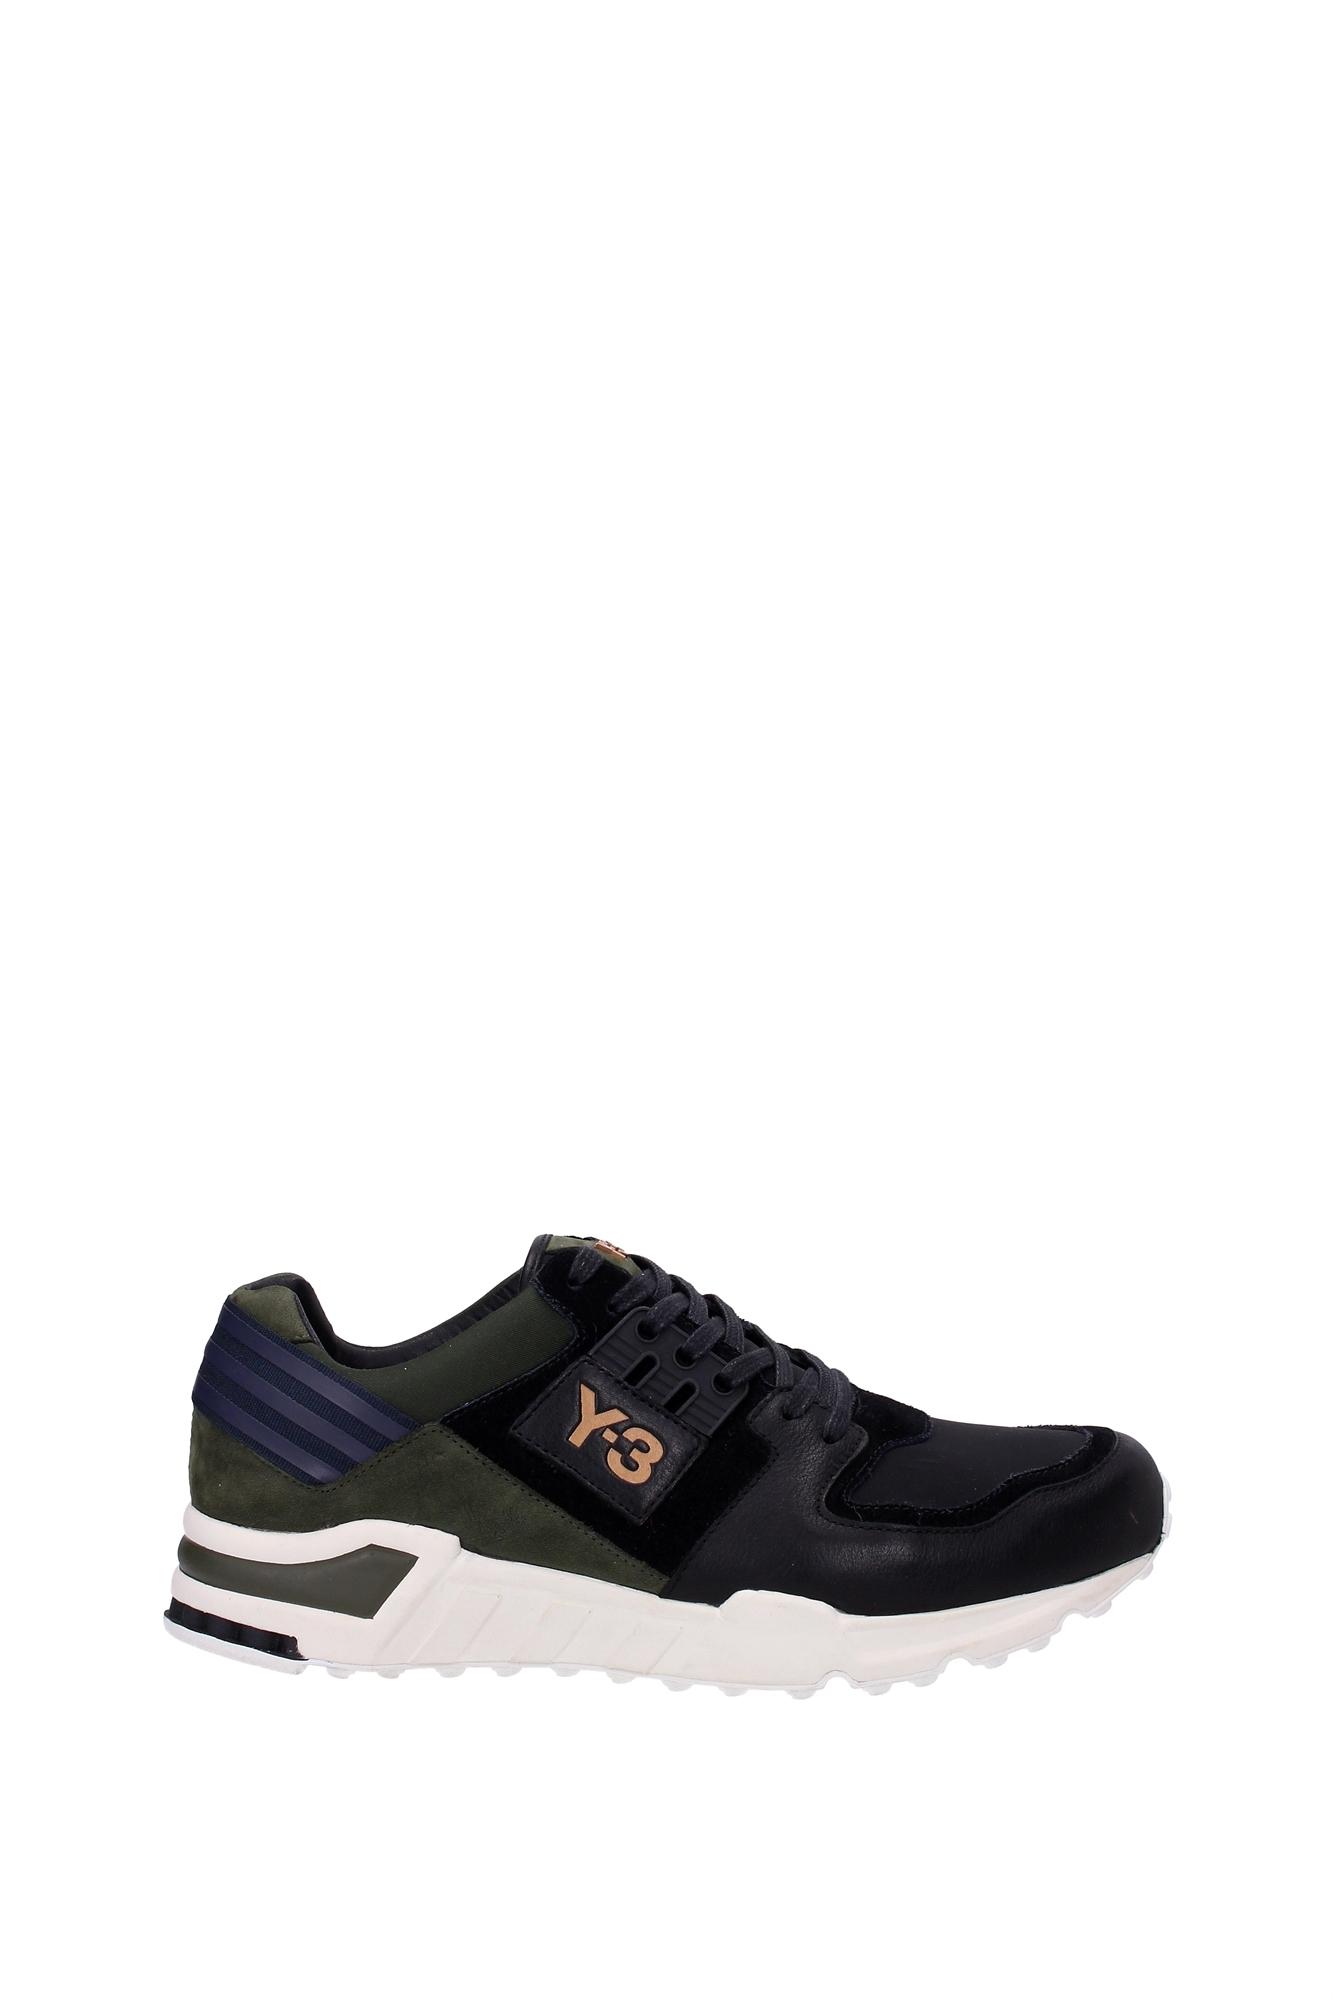 sneakers yamamoto y3 herren wildleder schwarz vernaf6197black ebay. Black Bedroom Furniture Sets. Home Design Ideas